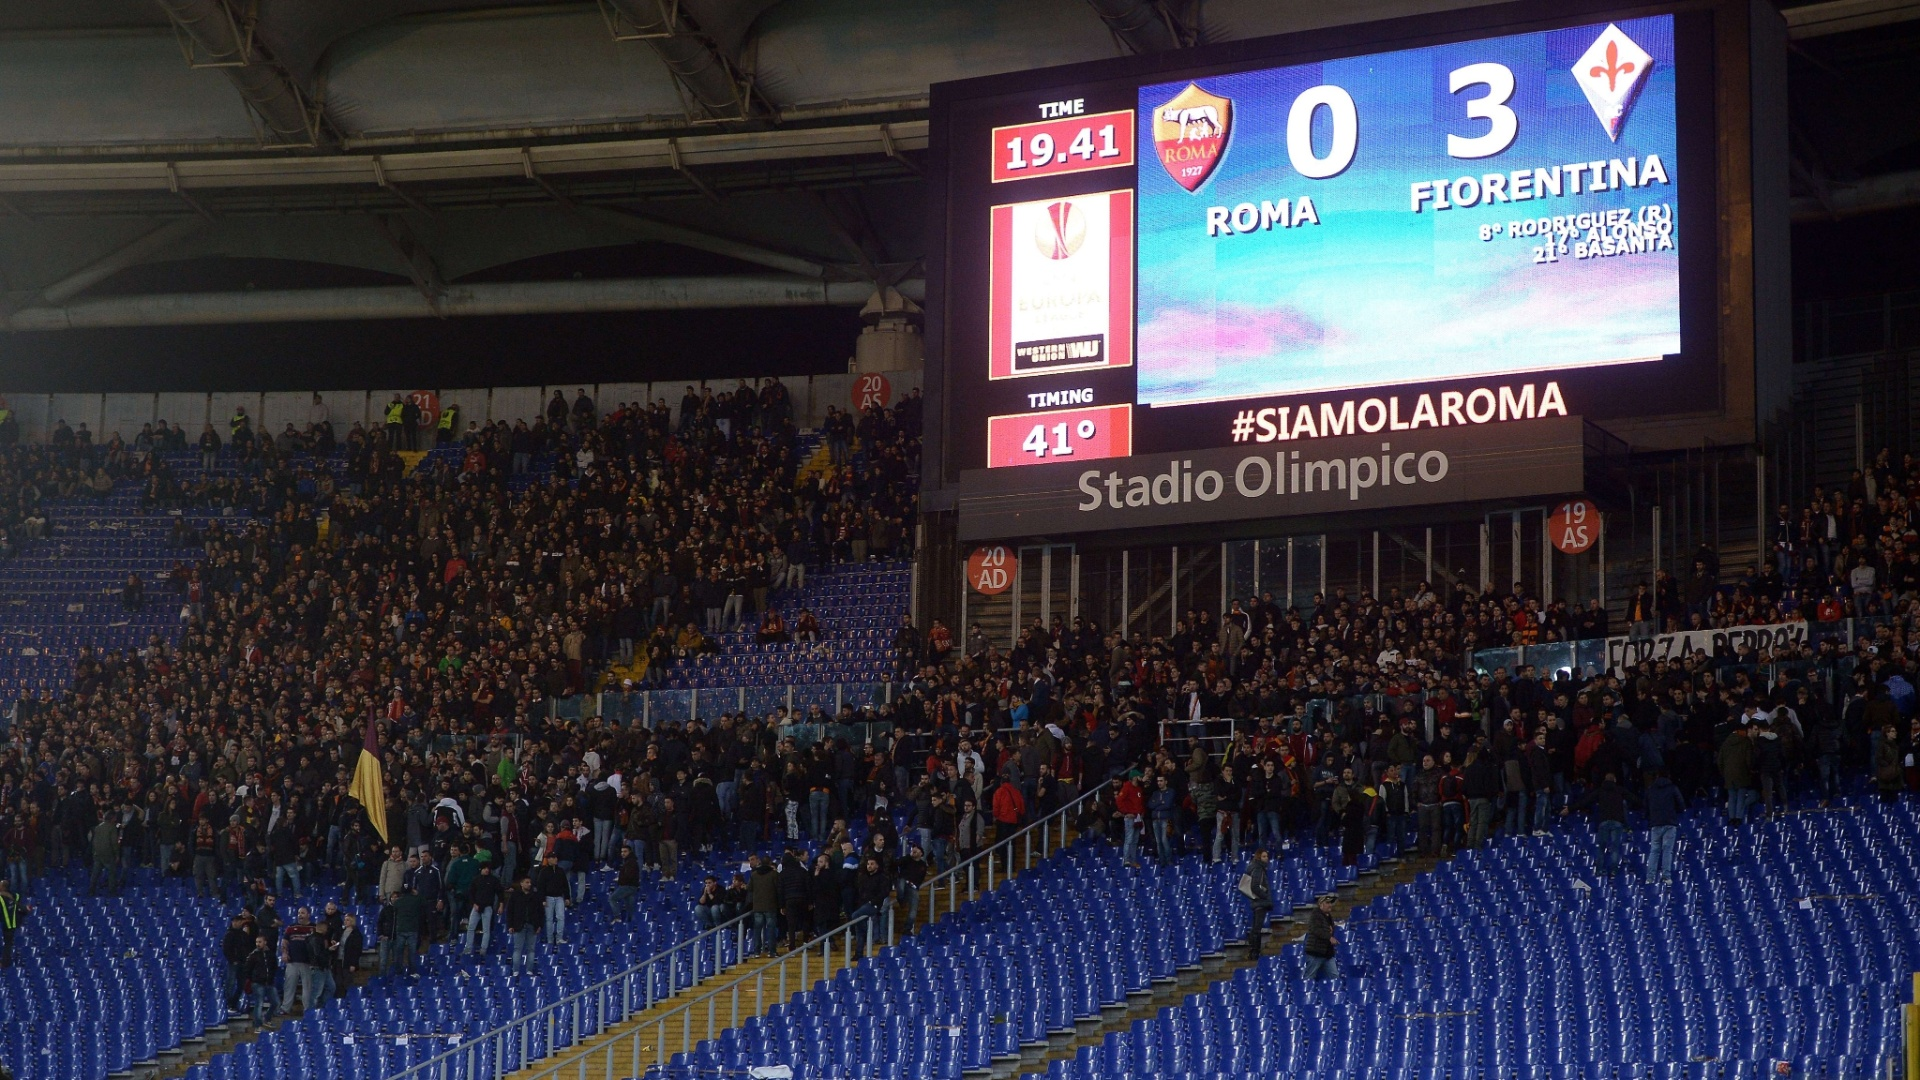 Torcida da Roma deixa o estádio ainda no primeiro tempo, como protesto por causa da derrota parcial para a Fiorentina